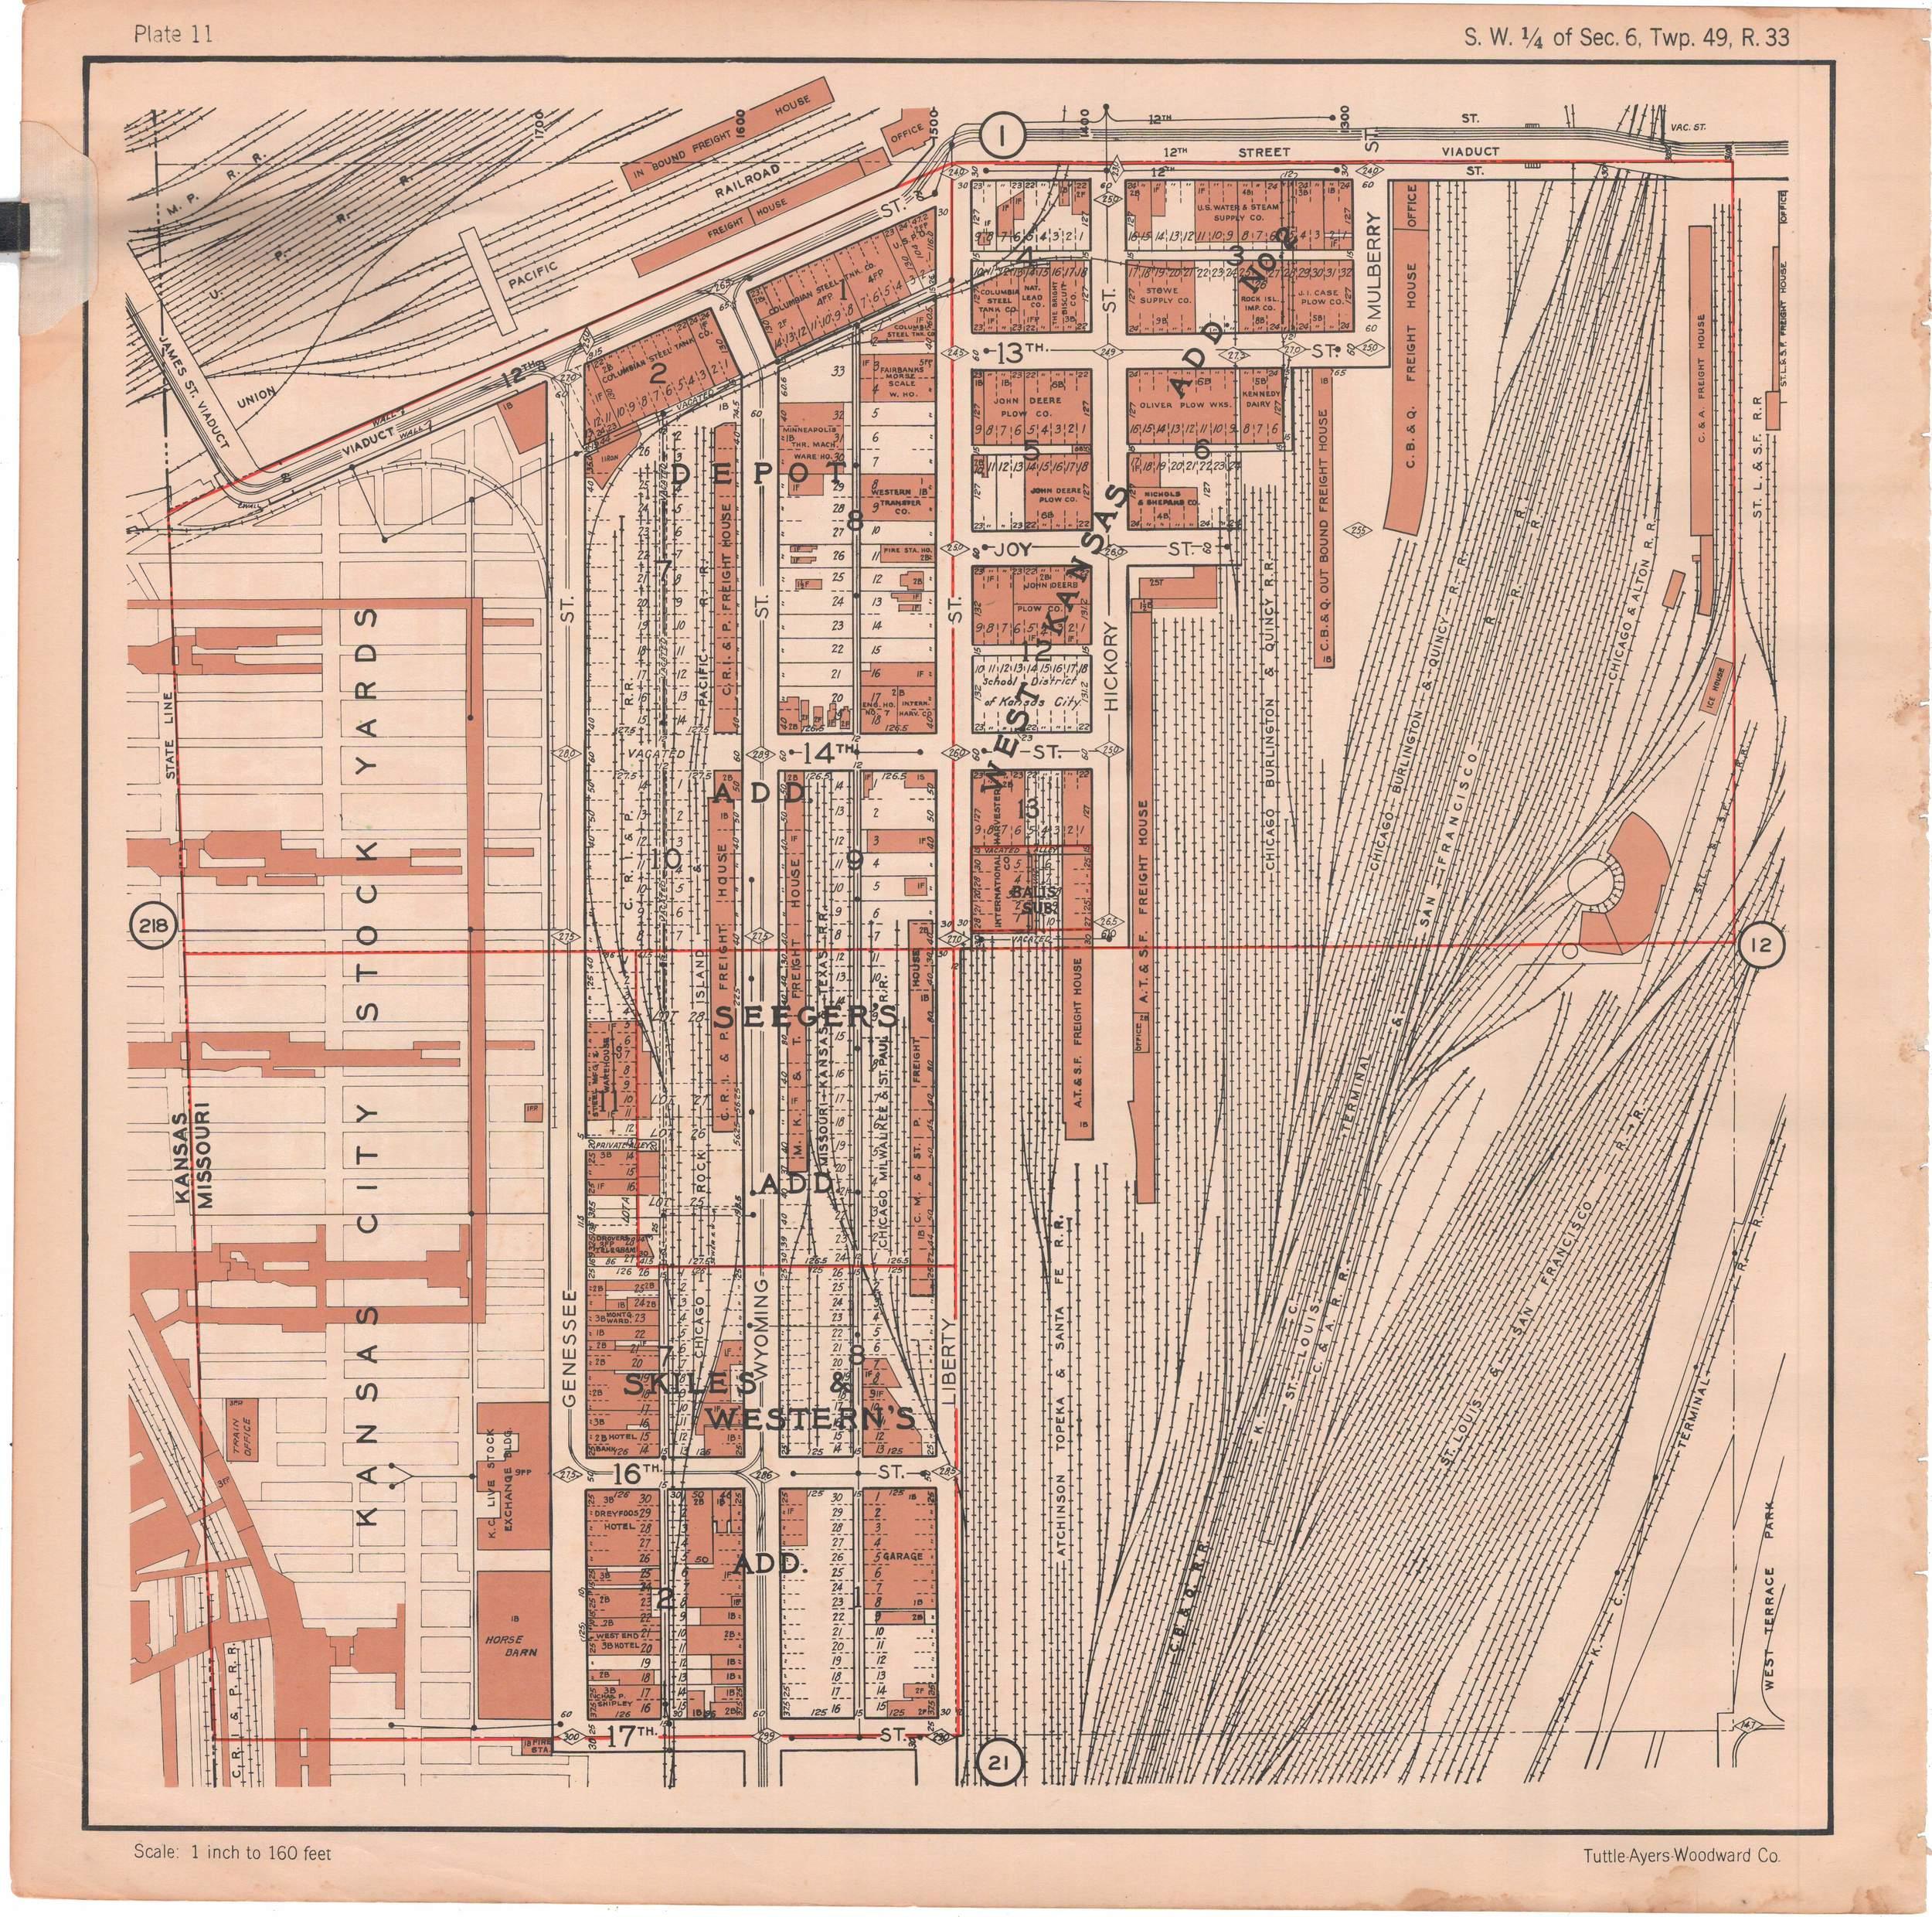 1925 TUTTLE_AYERS_Plate 11.JPG